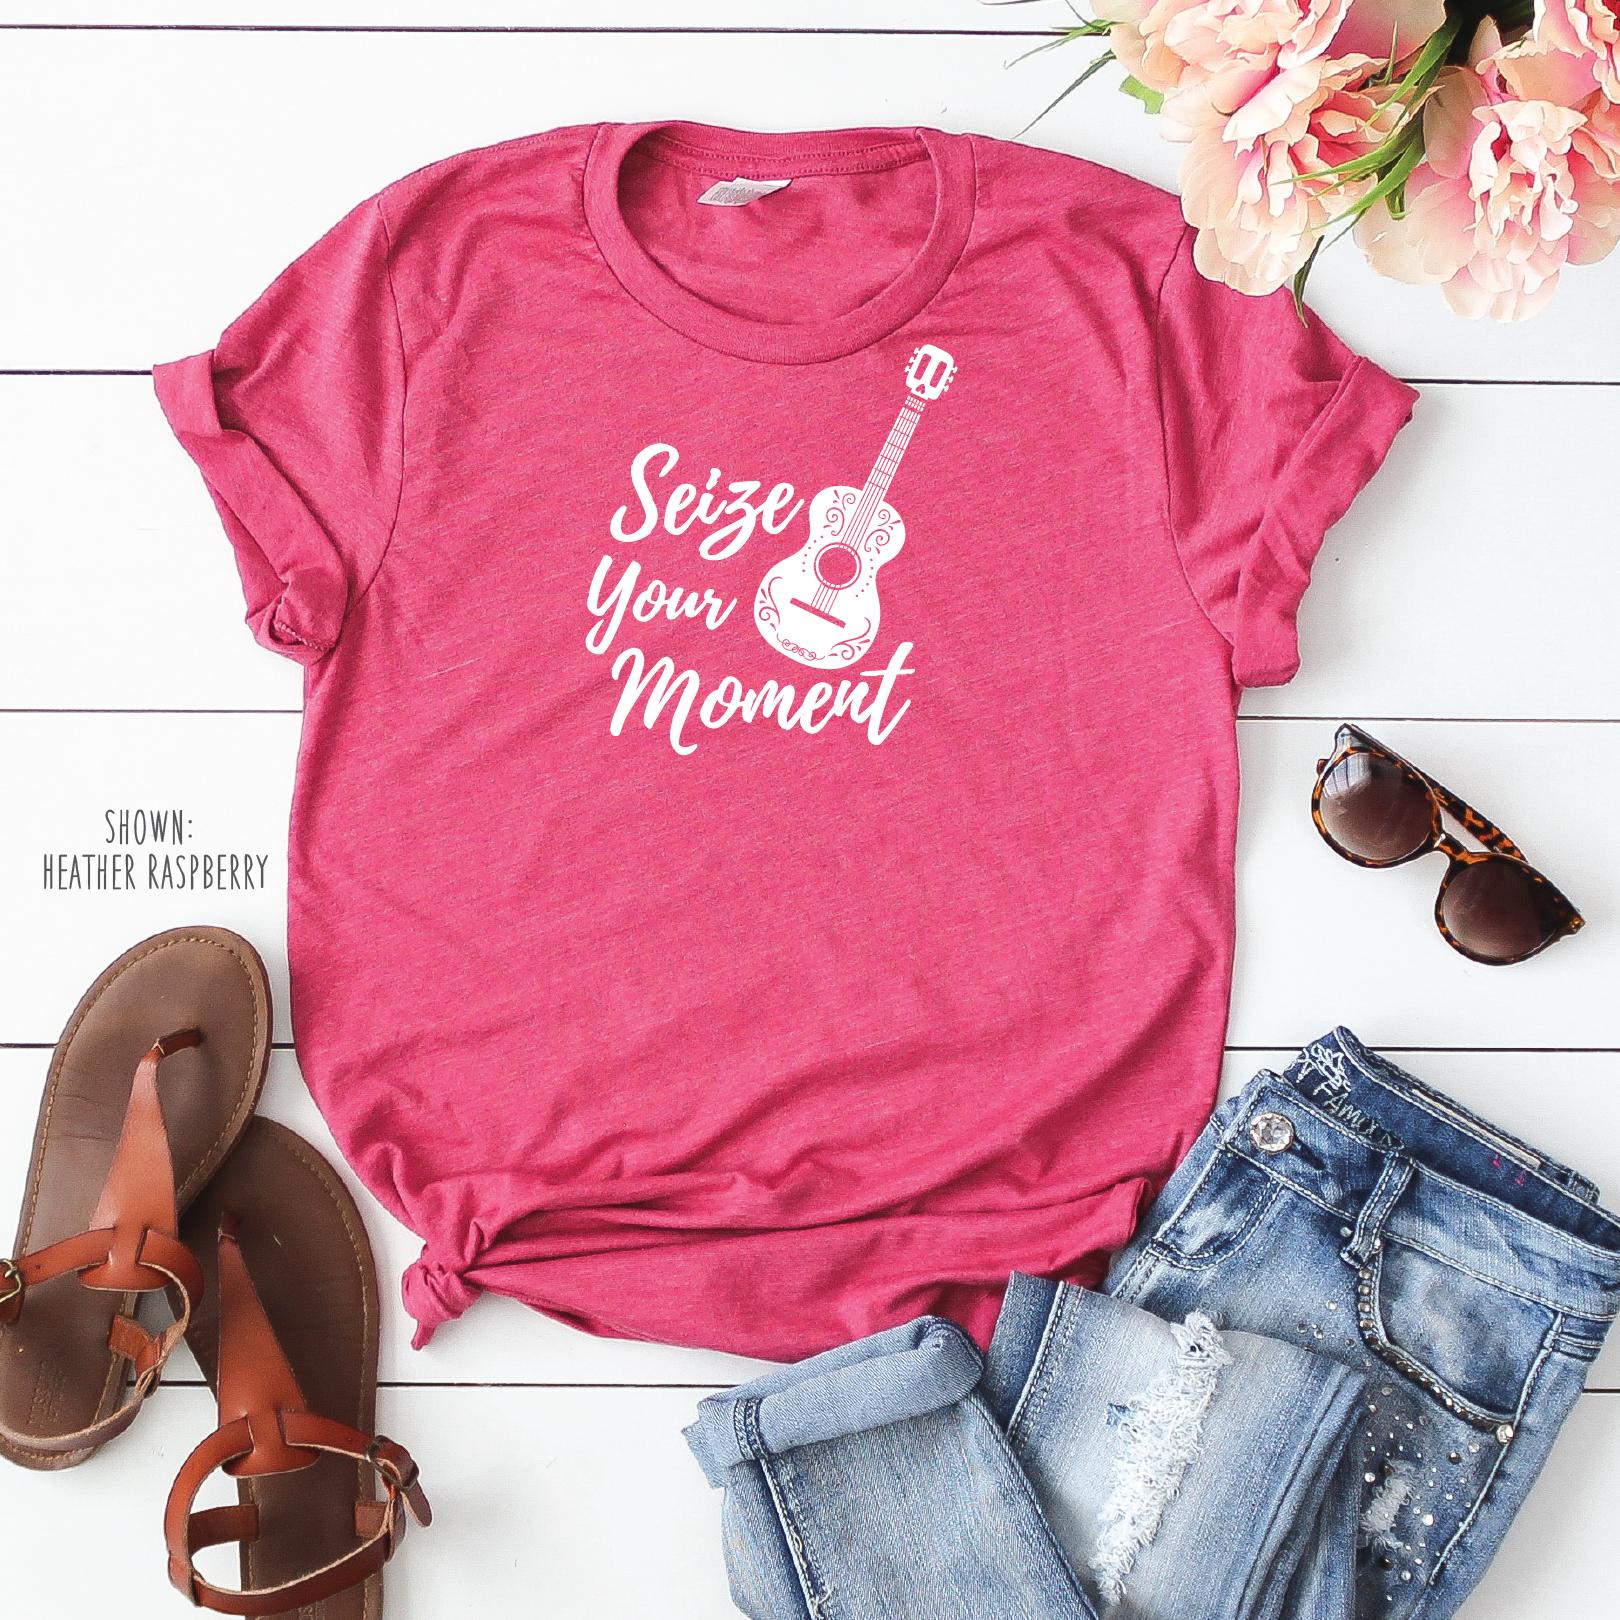 a2ed520257 Seize Your Moment - Disney/Pixar Coco Shirts for Men & Women - Disney/Pixar  Family Shirts - Disney Jersey Knit Shirt